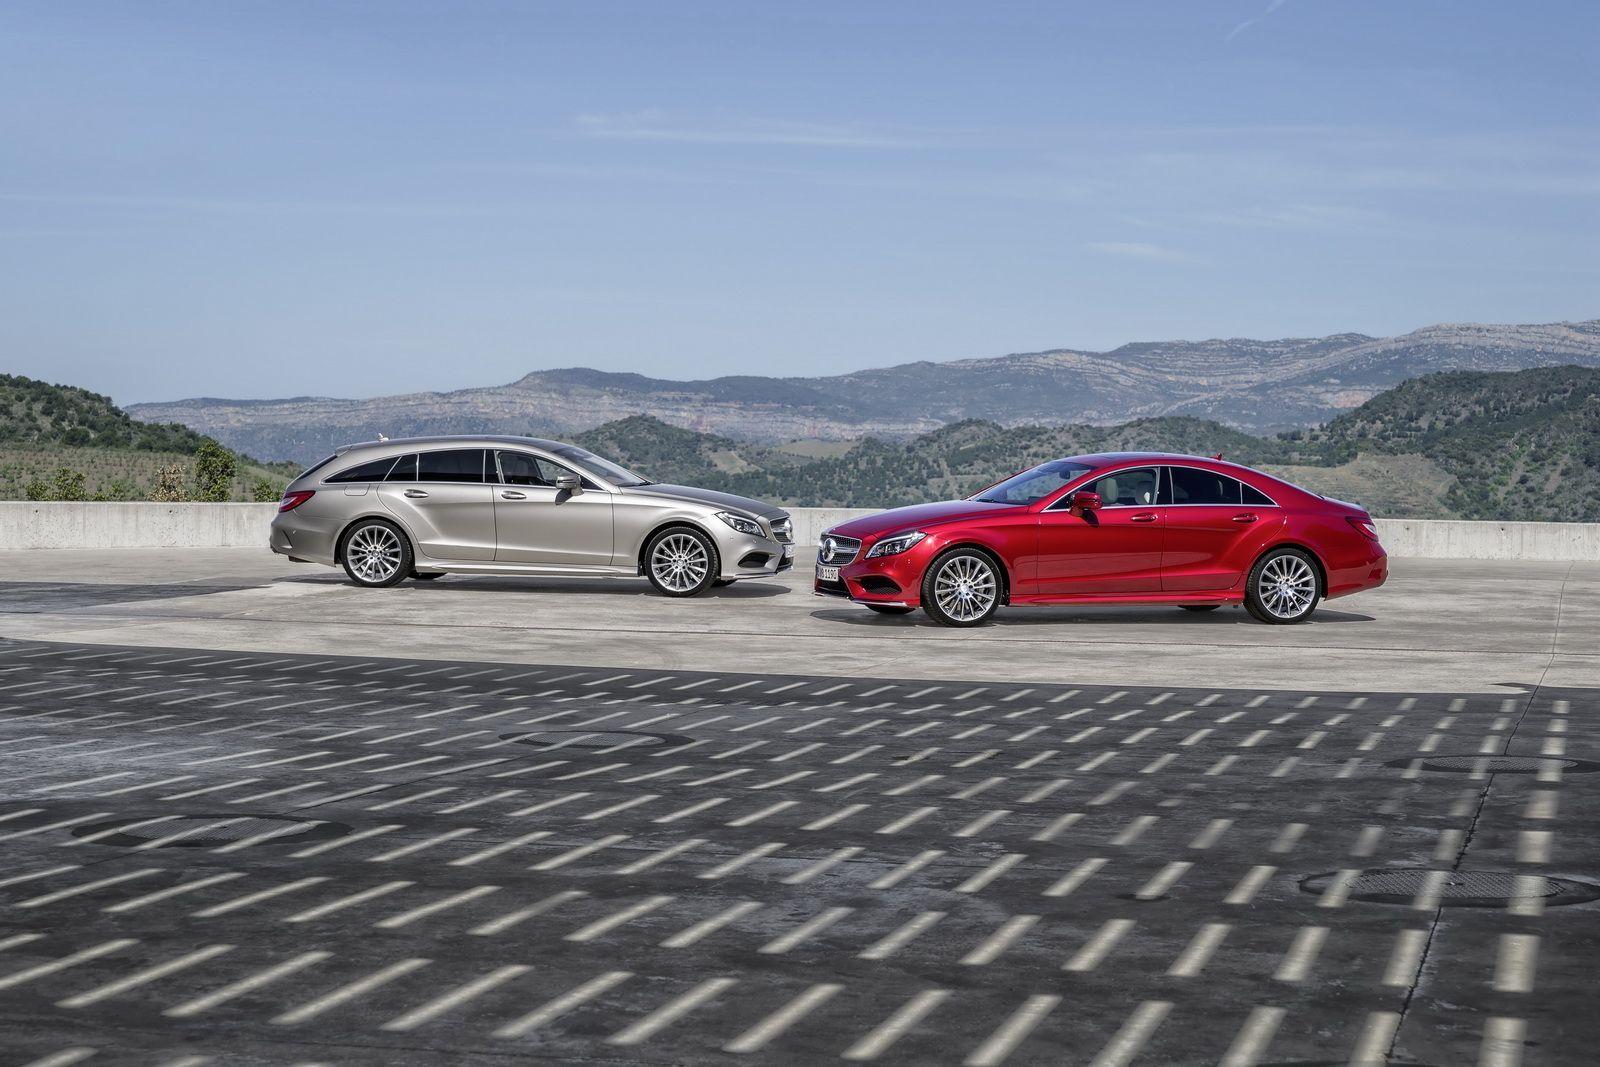 Mercedes CLS 2015: prezzi, caratteristiche e scheda tecnica